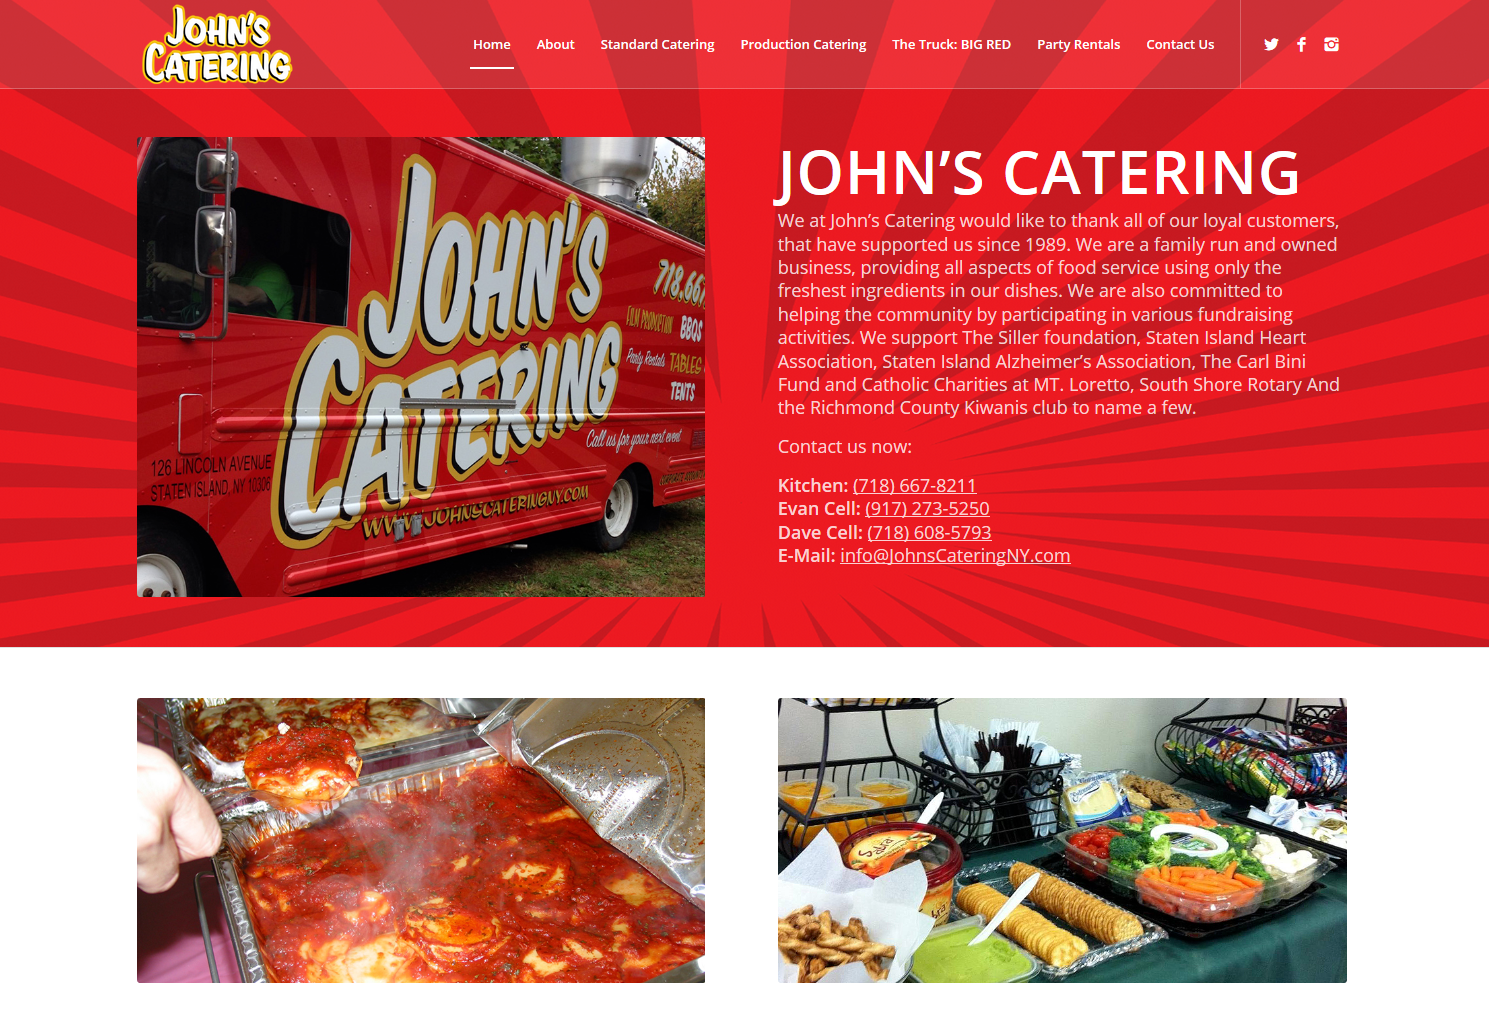 John's Catering